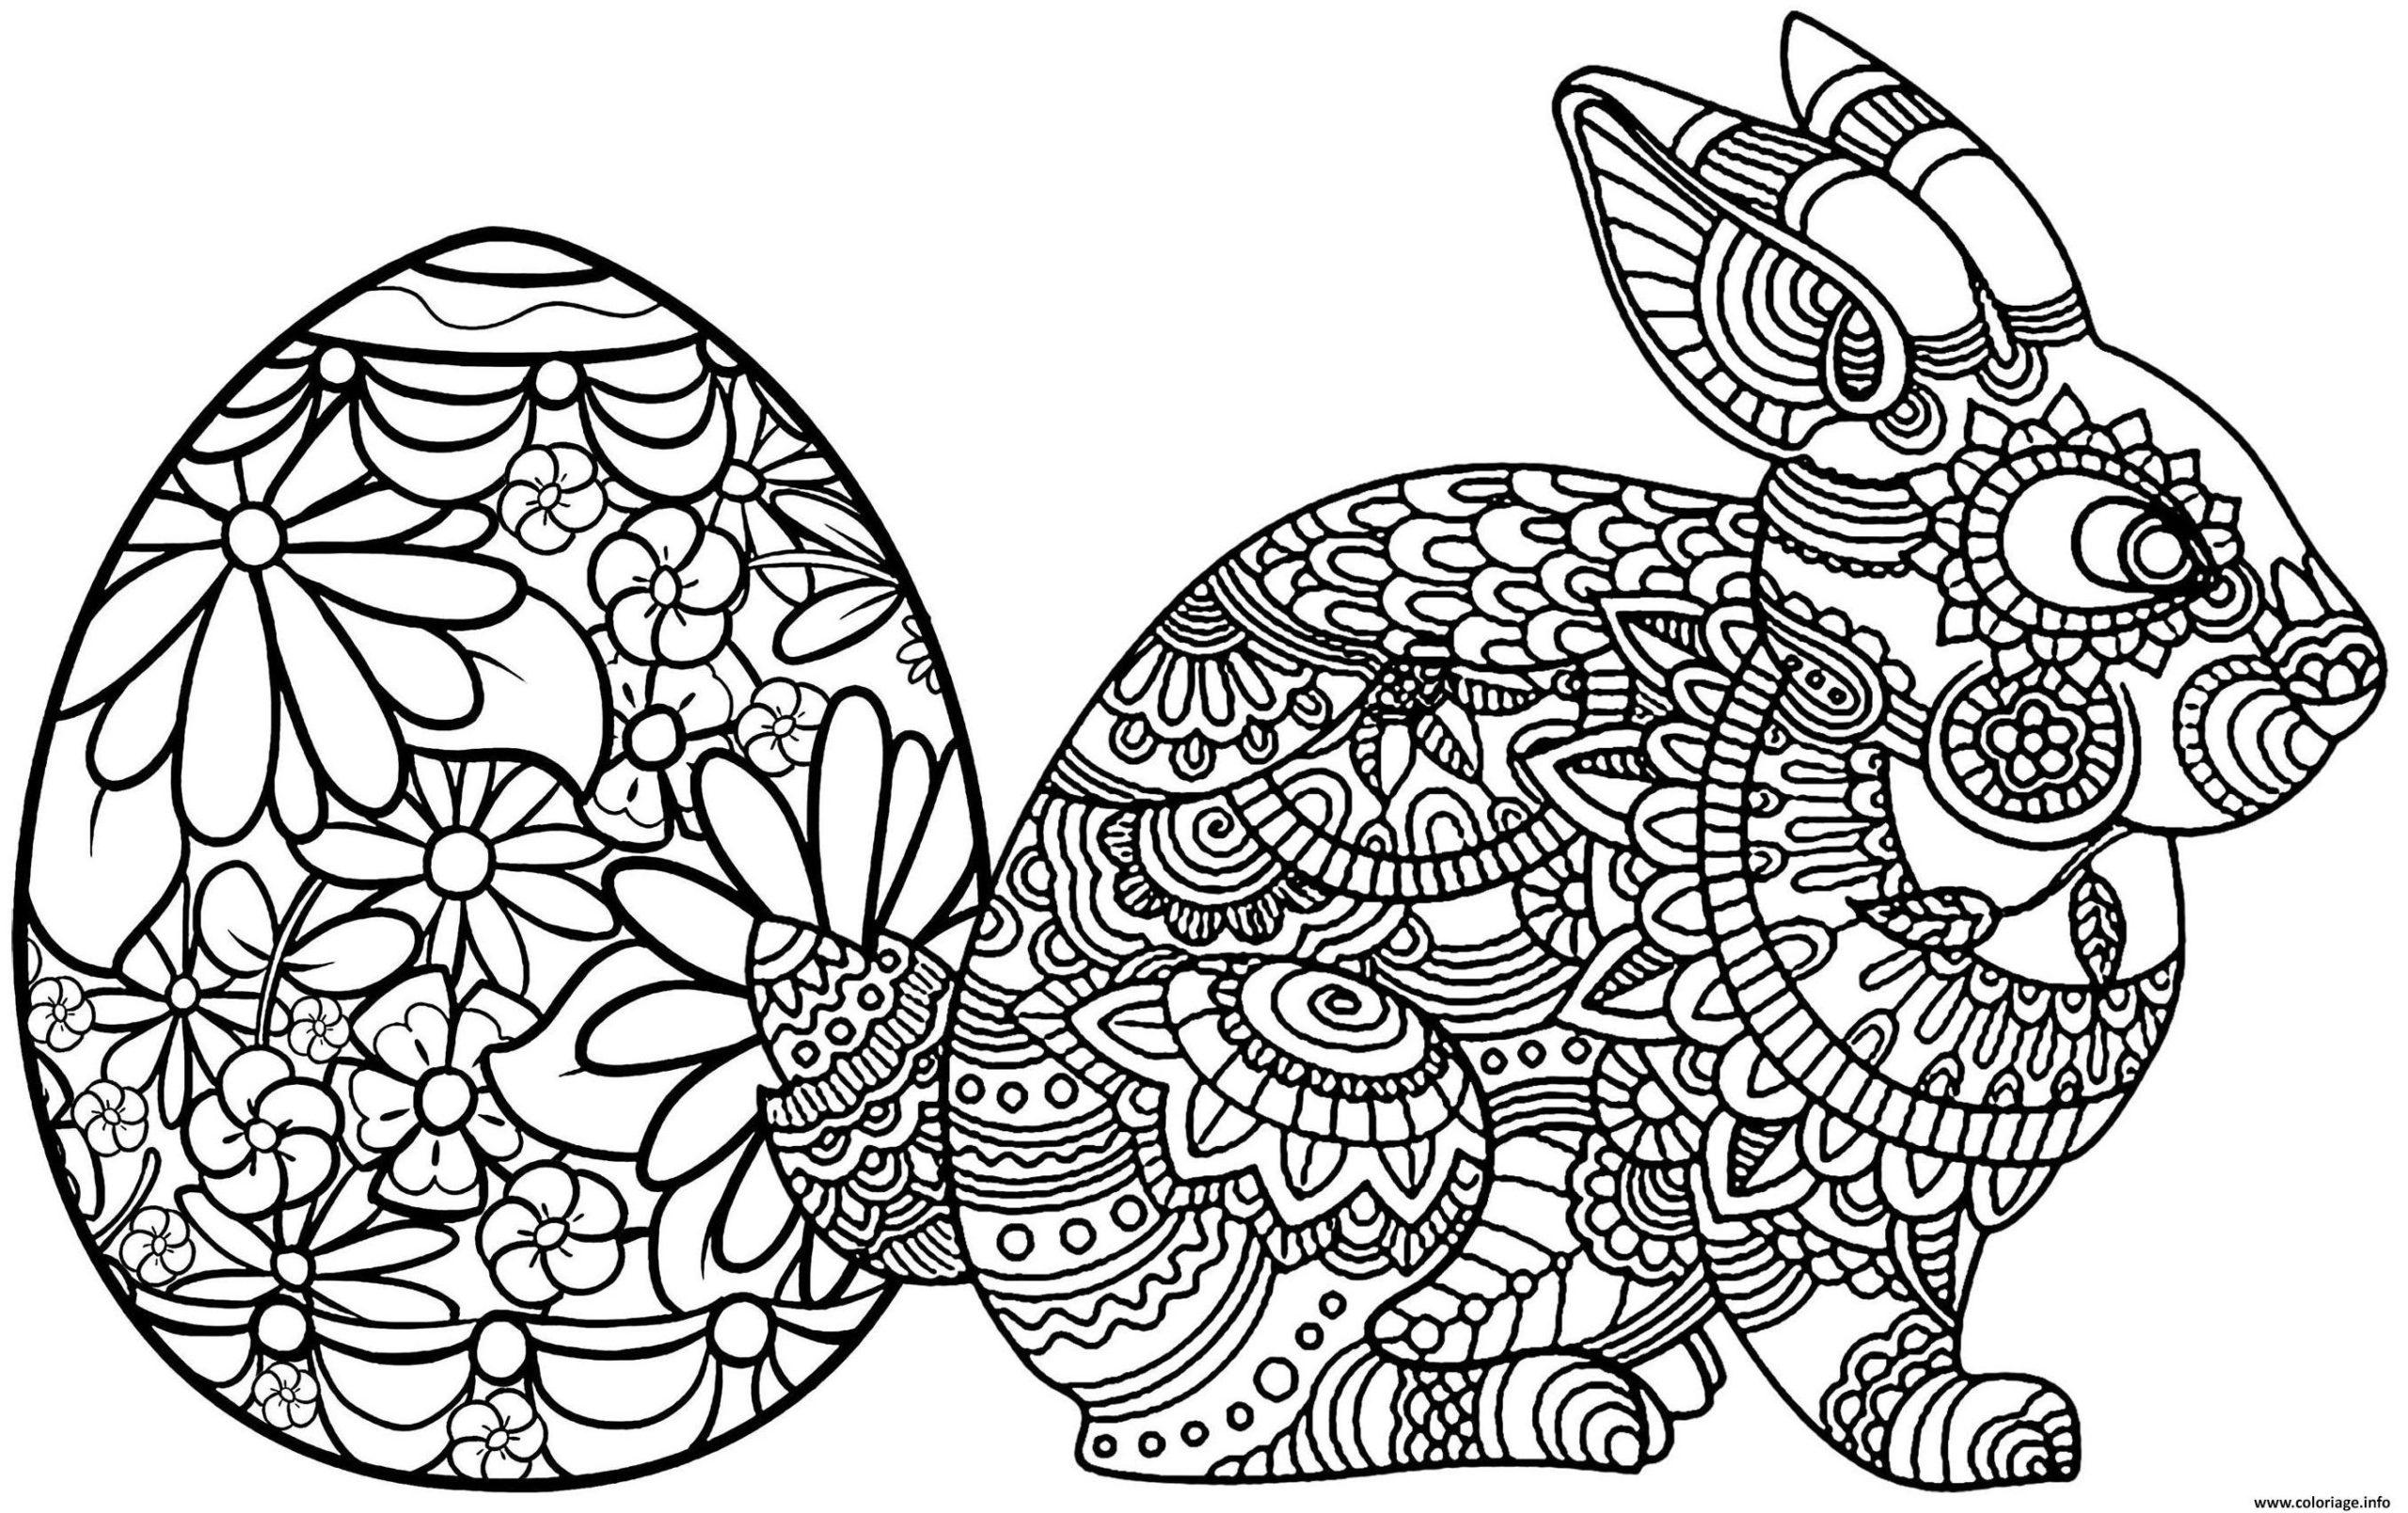 Coloriage Mandala Adulte A Imprimer Coloriage Imprimer